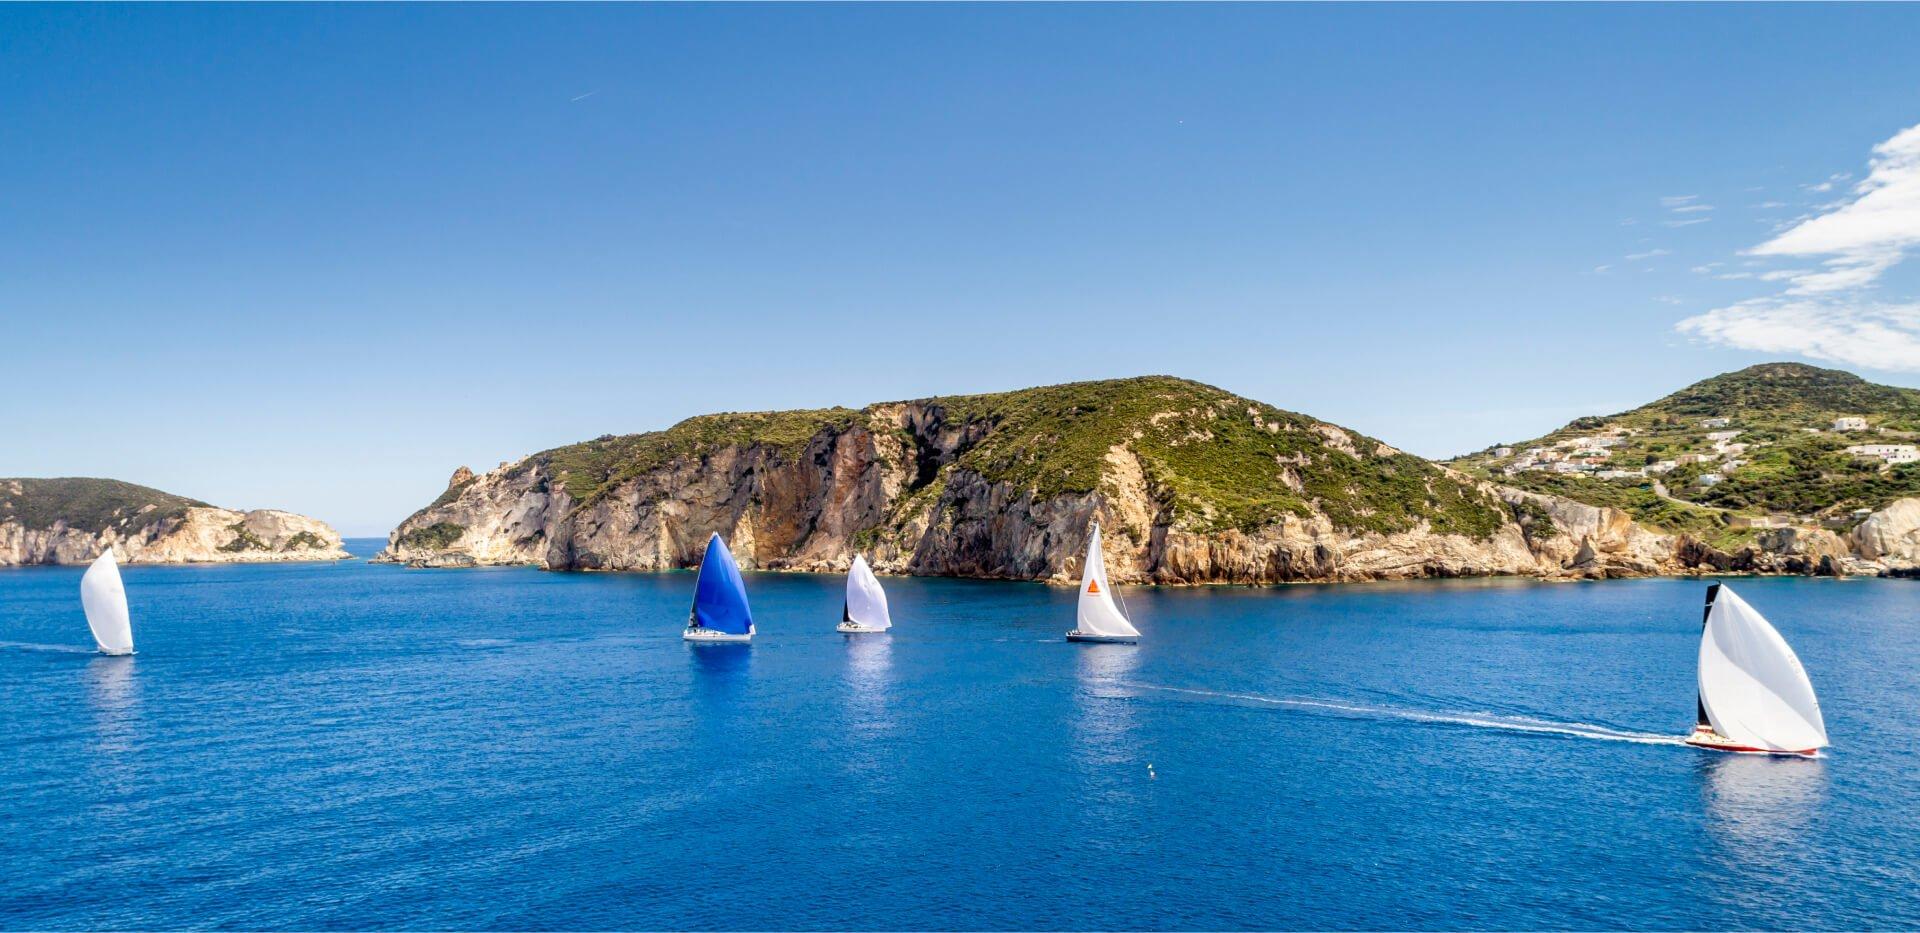 Slam y Rolex Capri Sailing Week, la primera cita no se olvida nunca